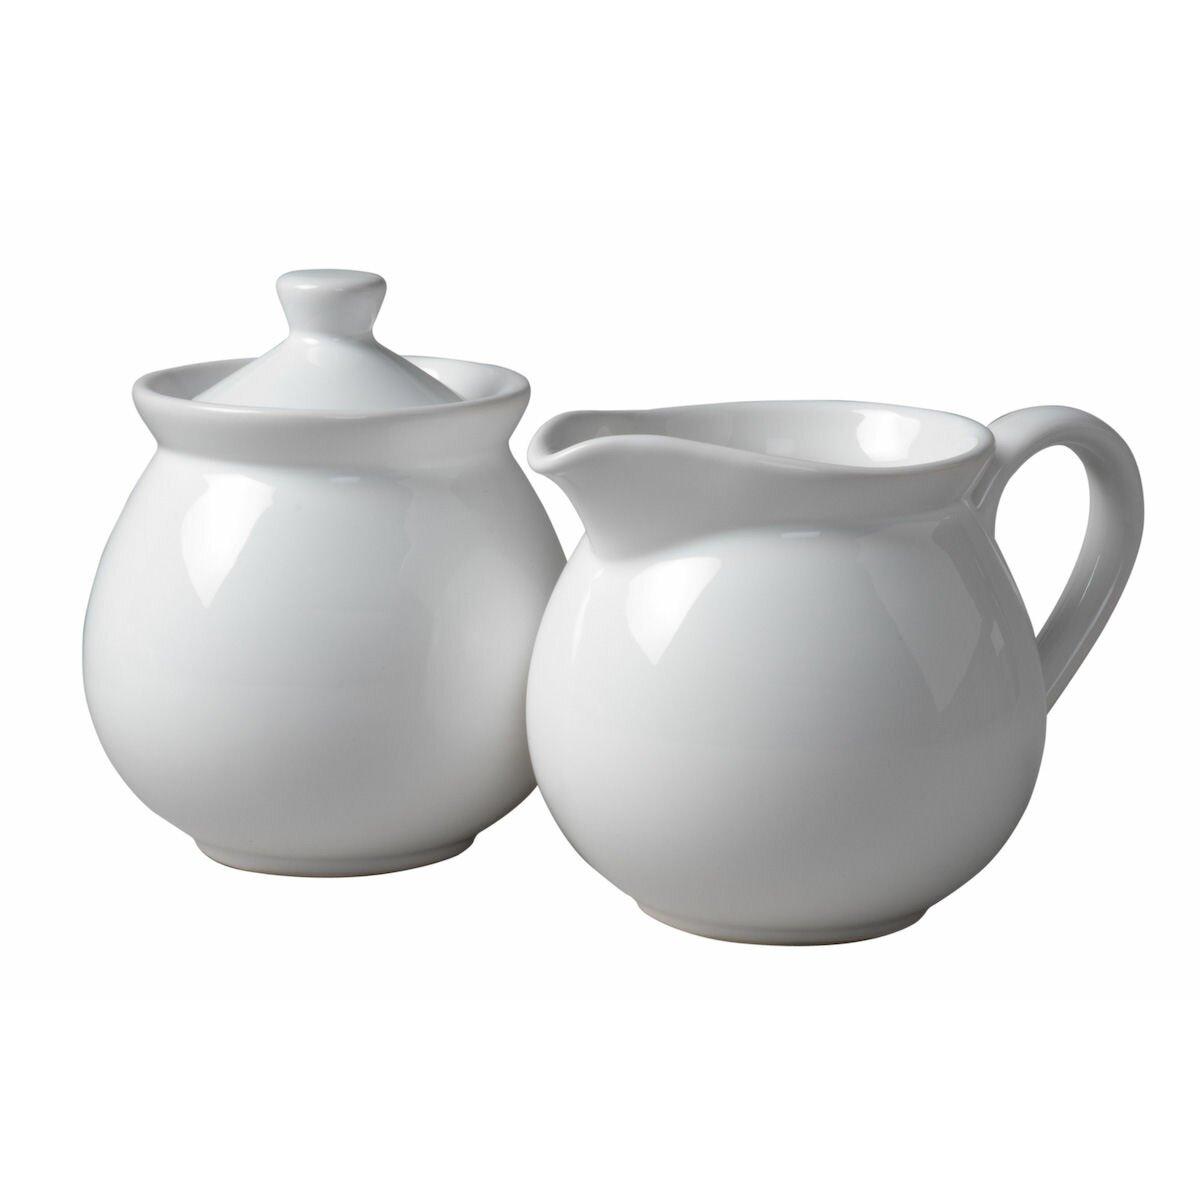 creamer and sugar set - red barrel studio chartridge piece sugar bowl creamer set